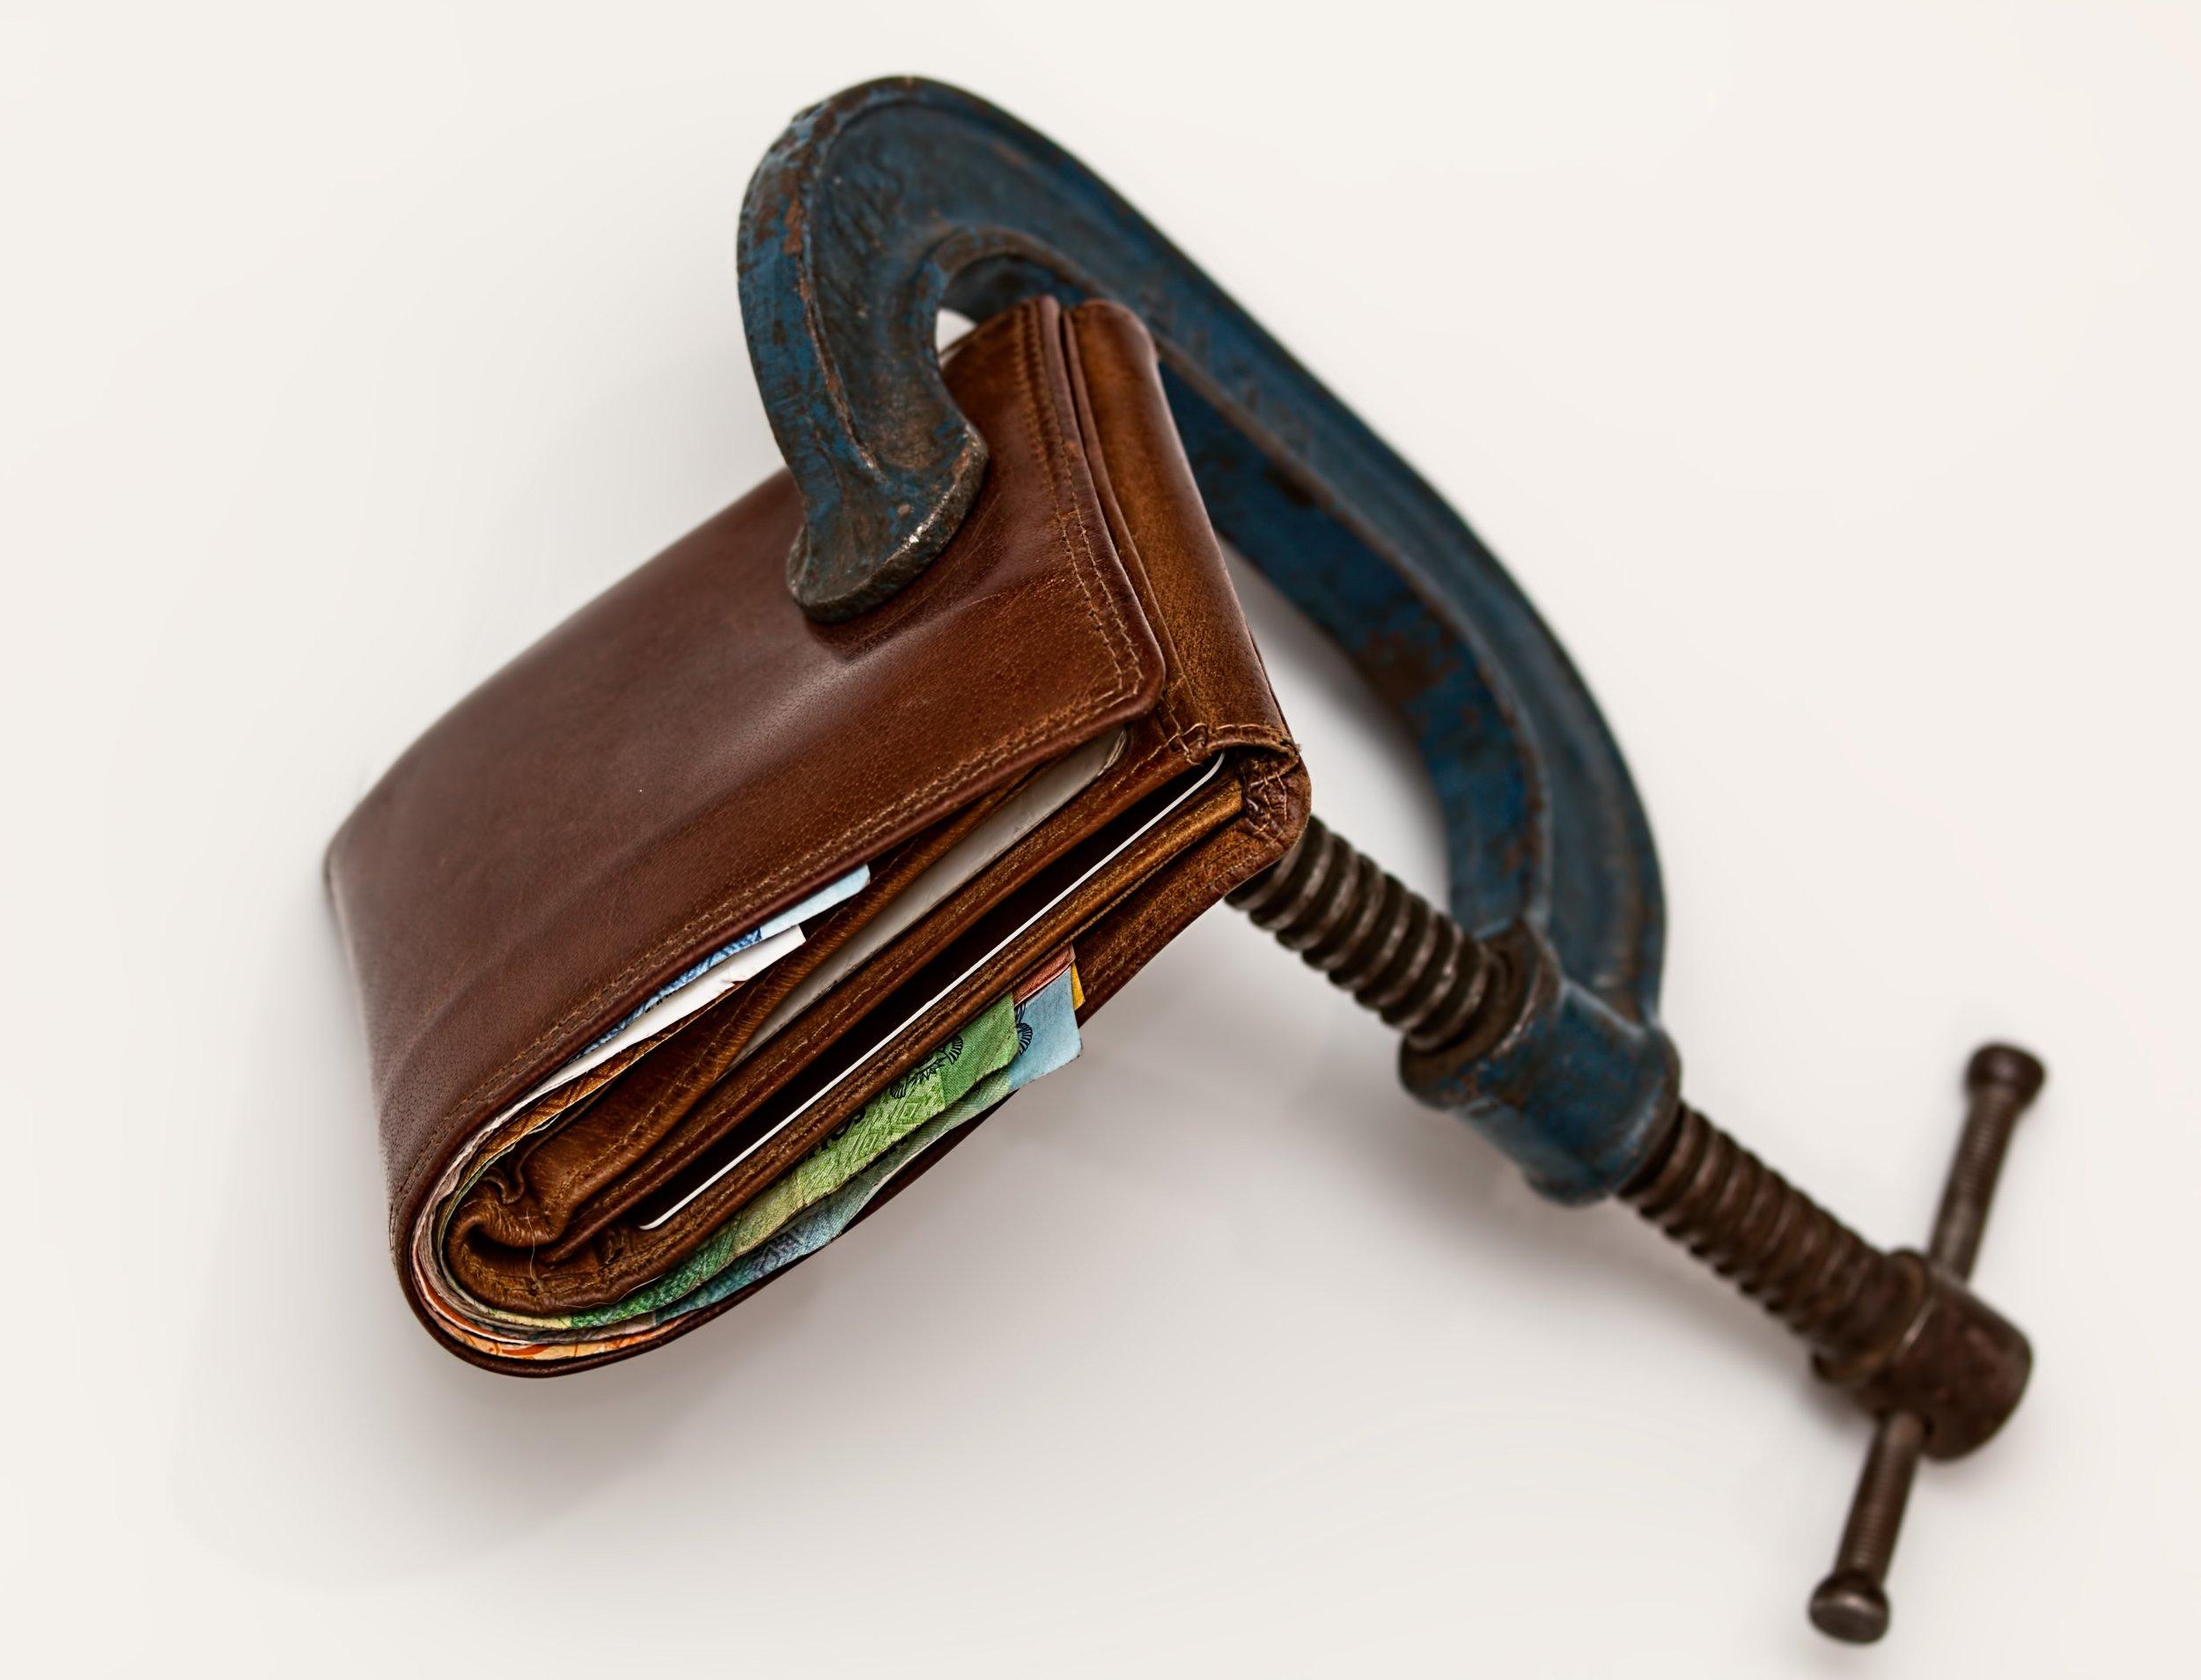 credit-squeeze-taxation-purse-tax-46242.jpg